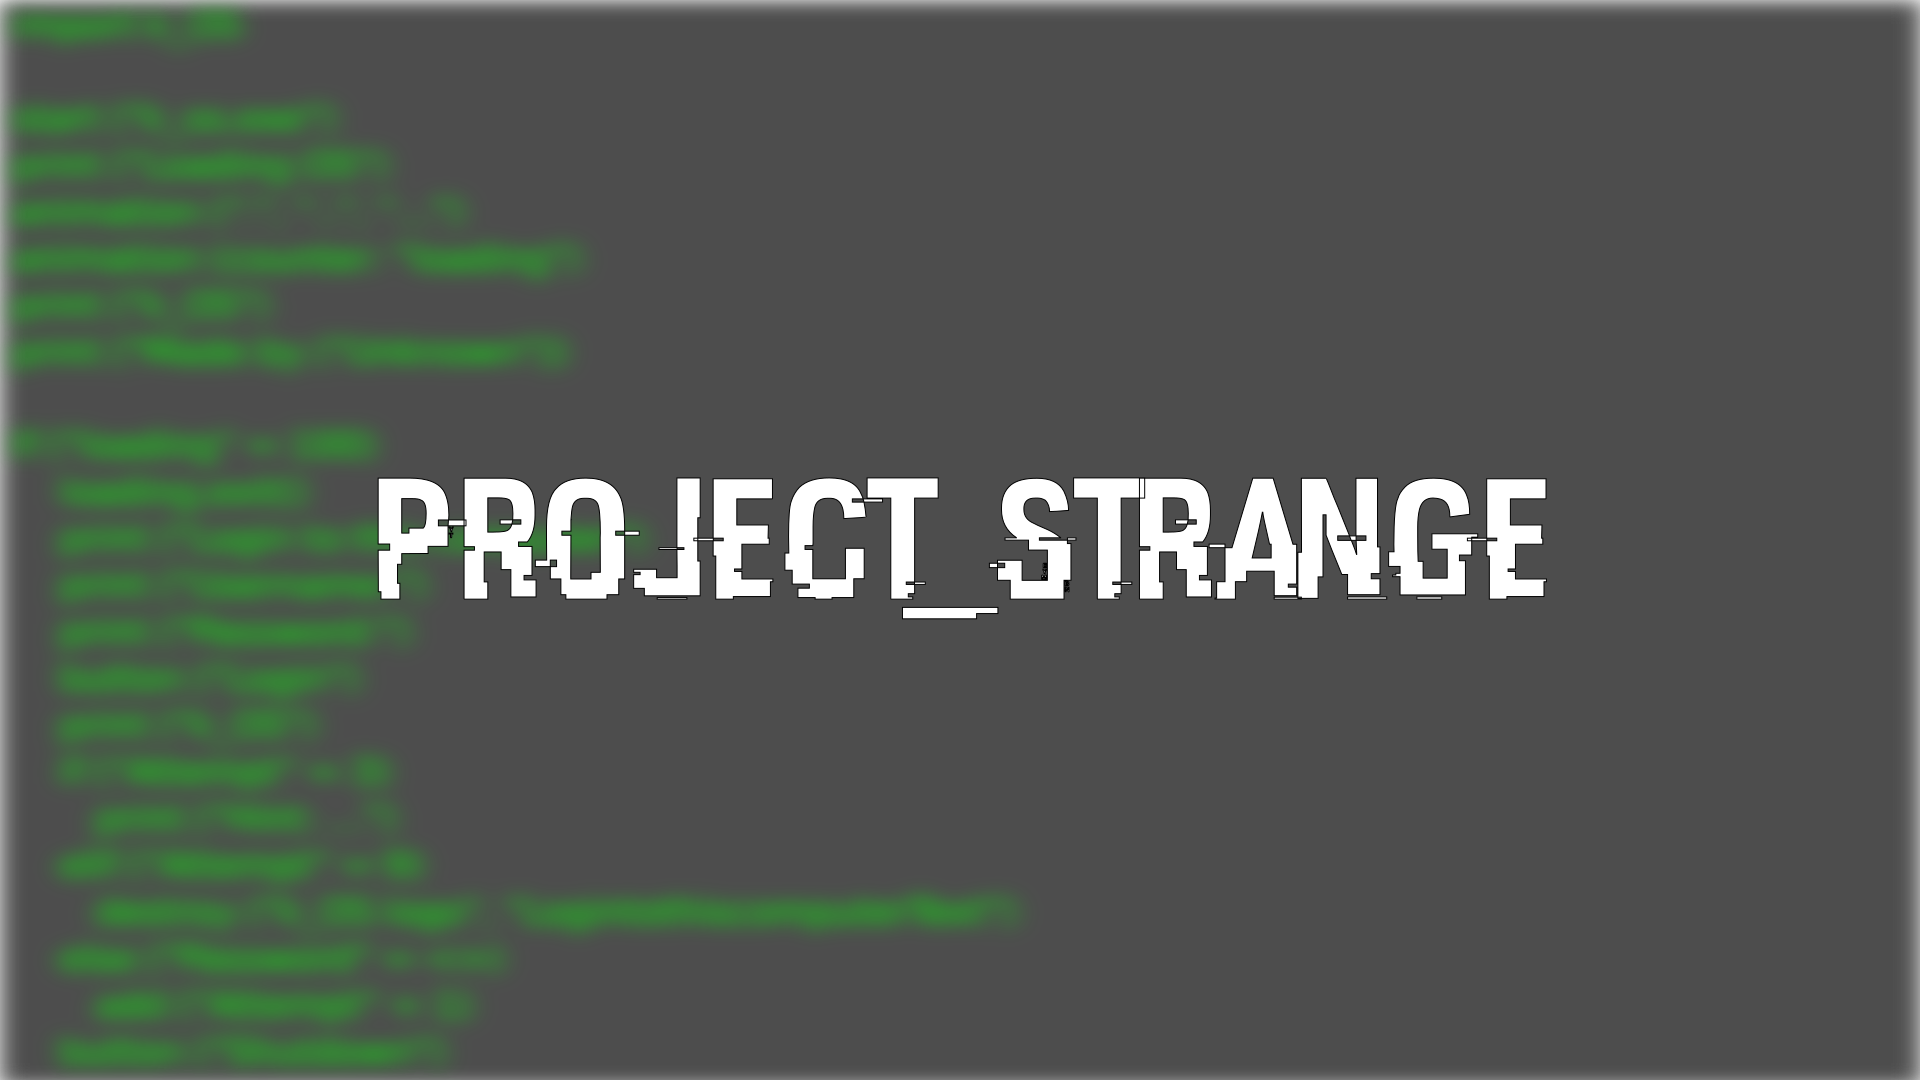 Project Strange